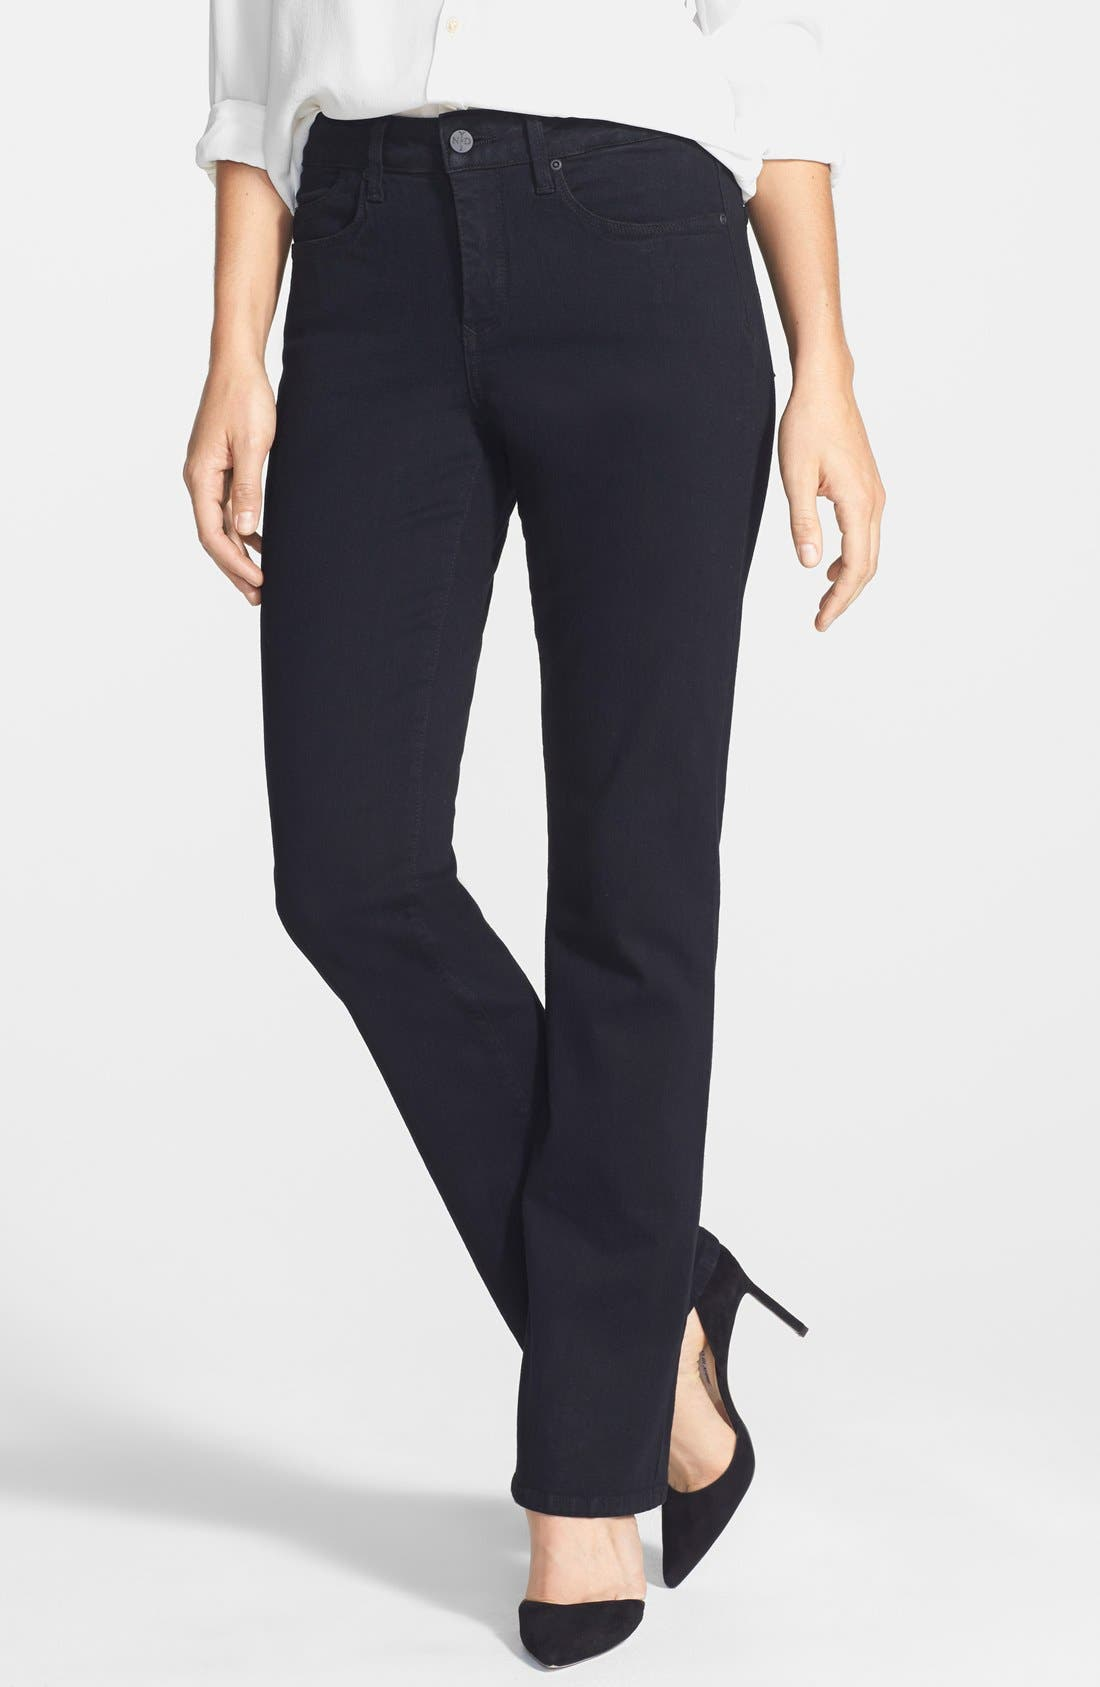 'Billie' Stretch Mini Bootcut Jeans,                         Main,                         color, Black